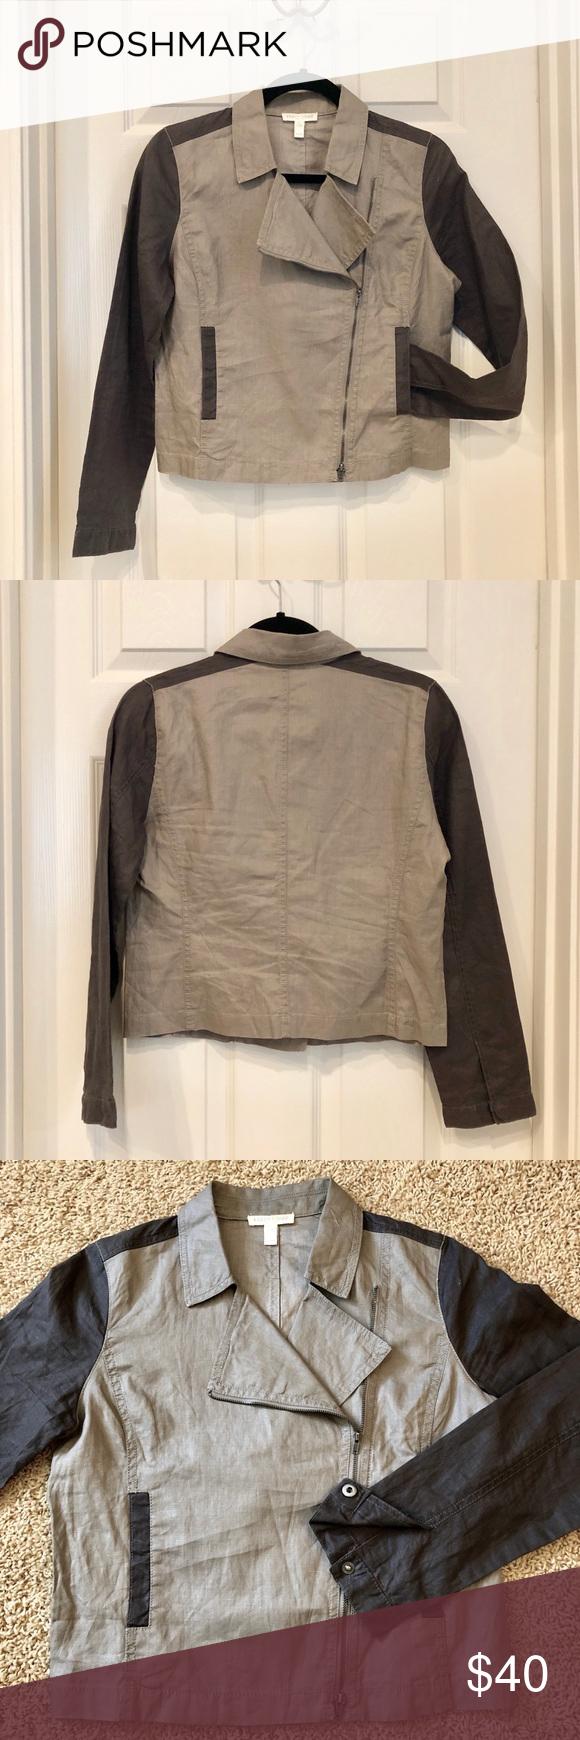 Eileen Fisher Jacket Eileen Fisher Jacket Clothes Design Long Sleeve Tshirt Men [ 1740 x 580 Pixel ]